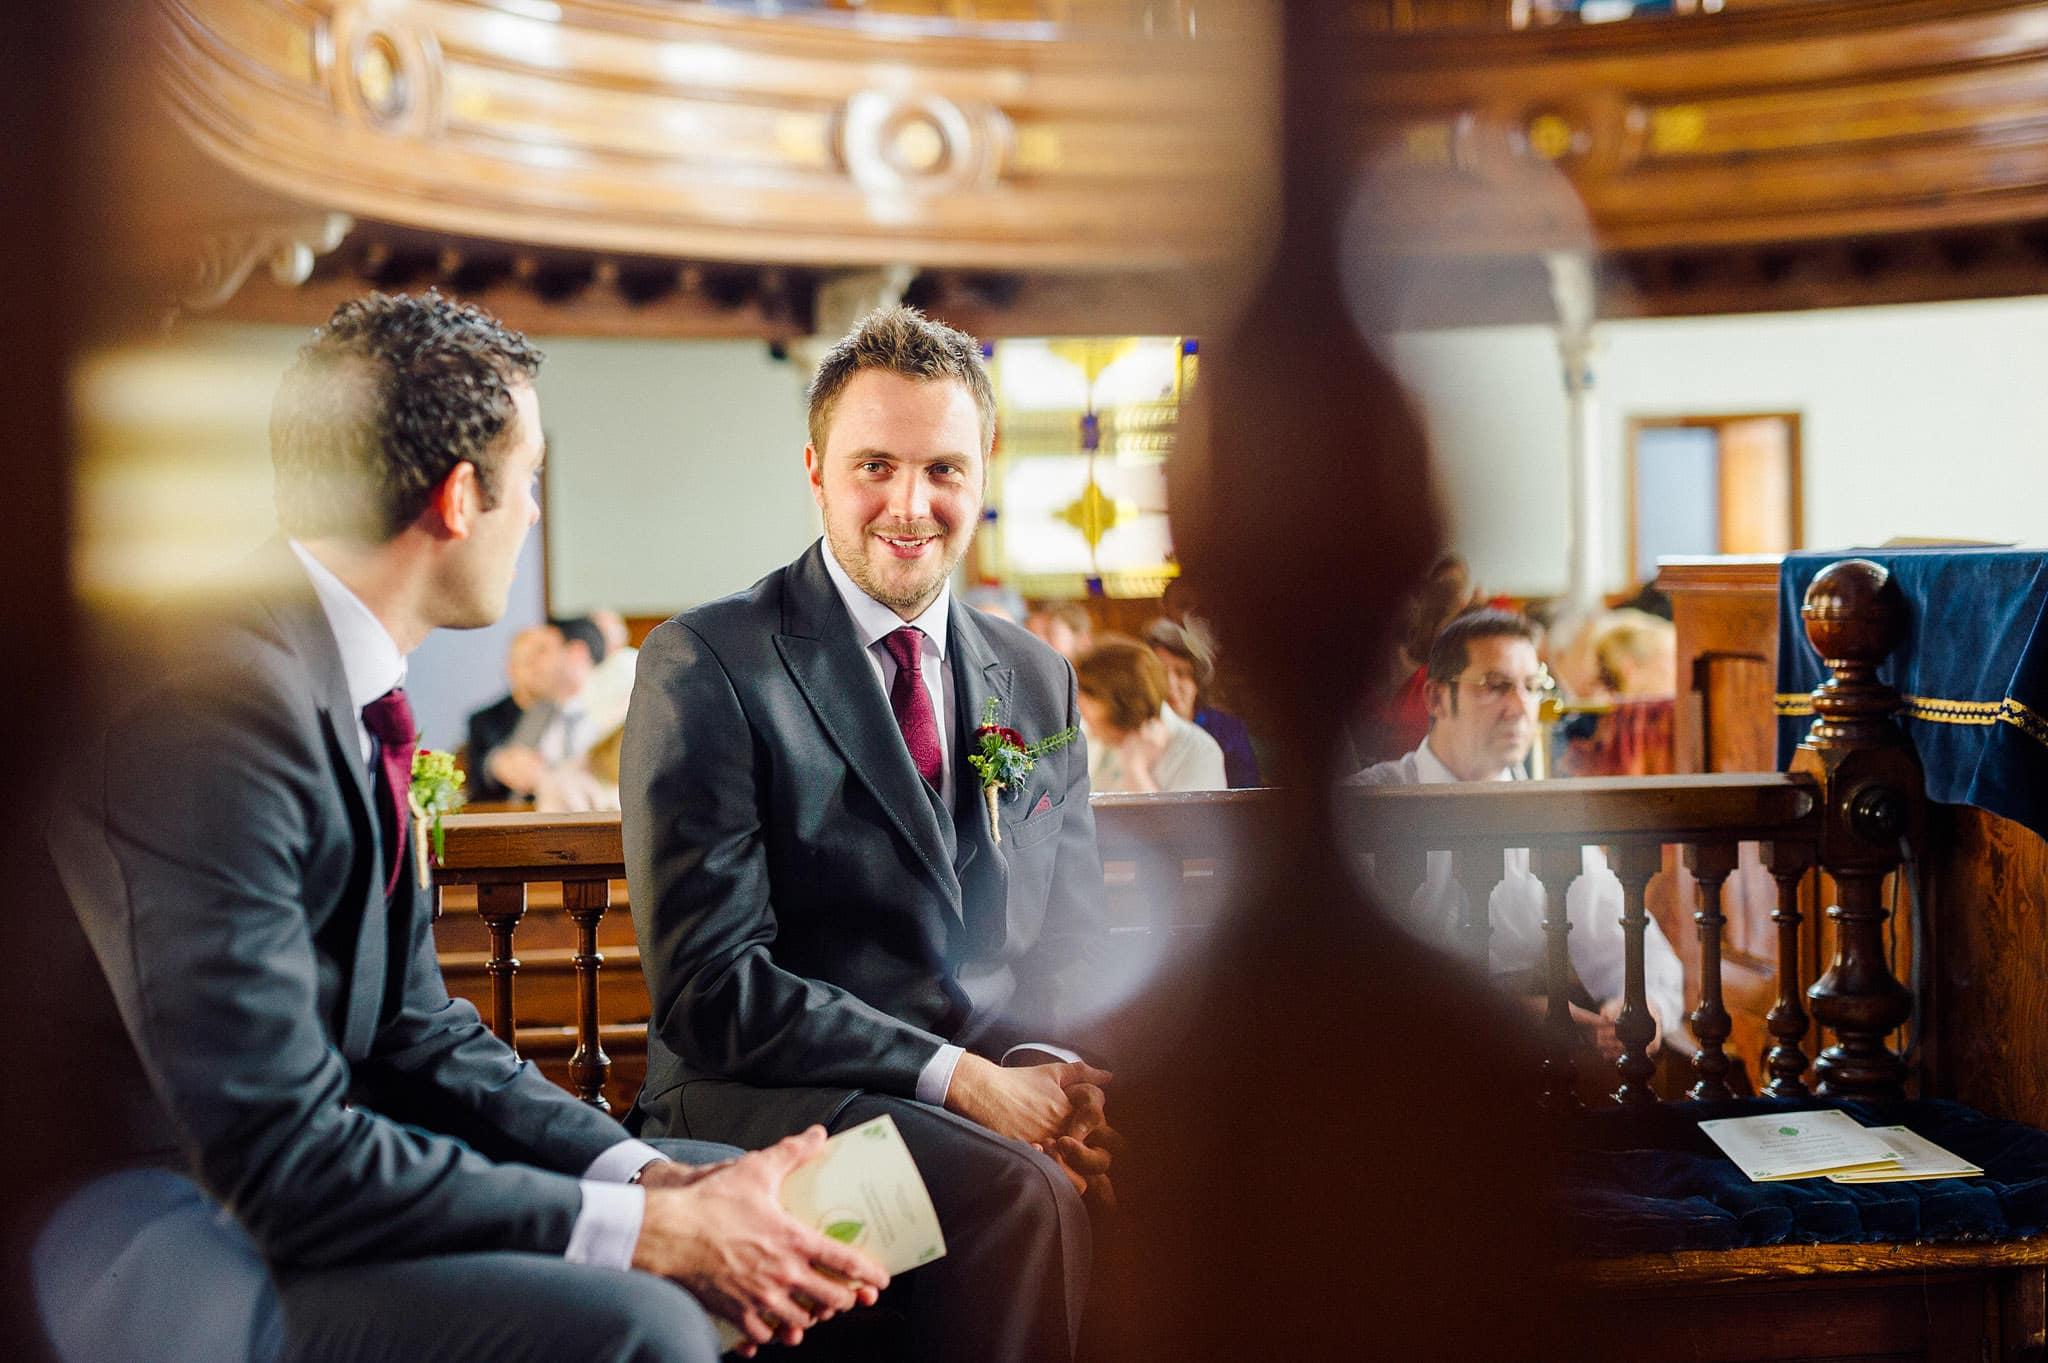 wedding-photographer-aberystwyth-wales (34)